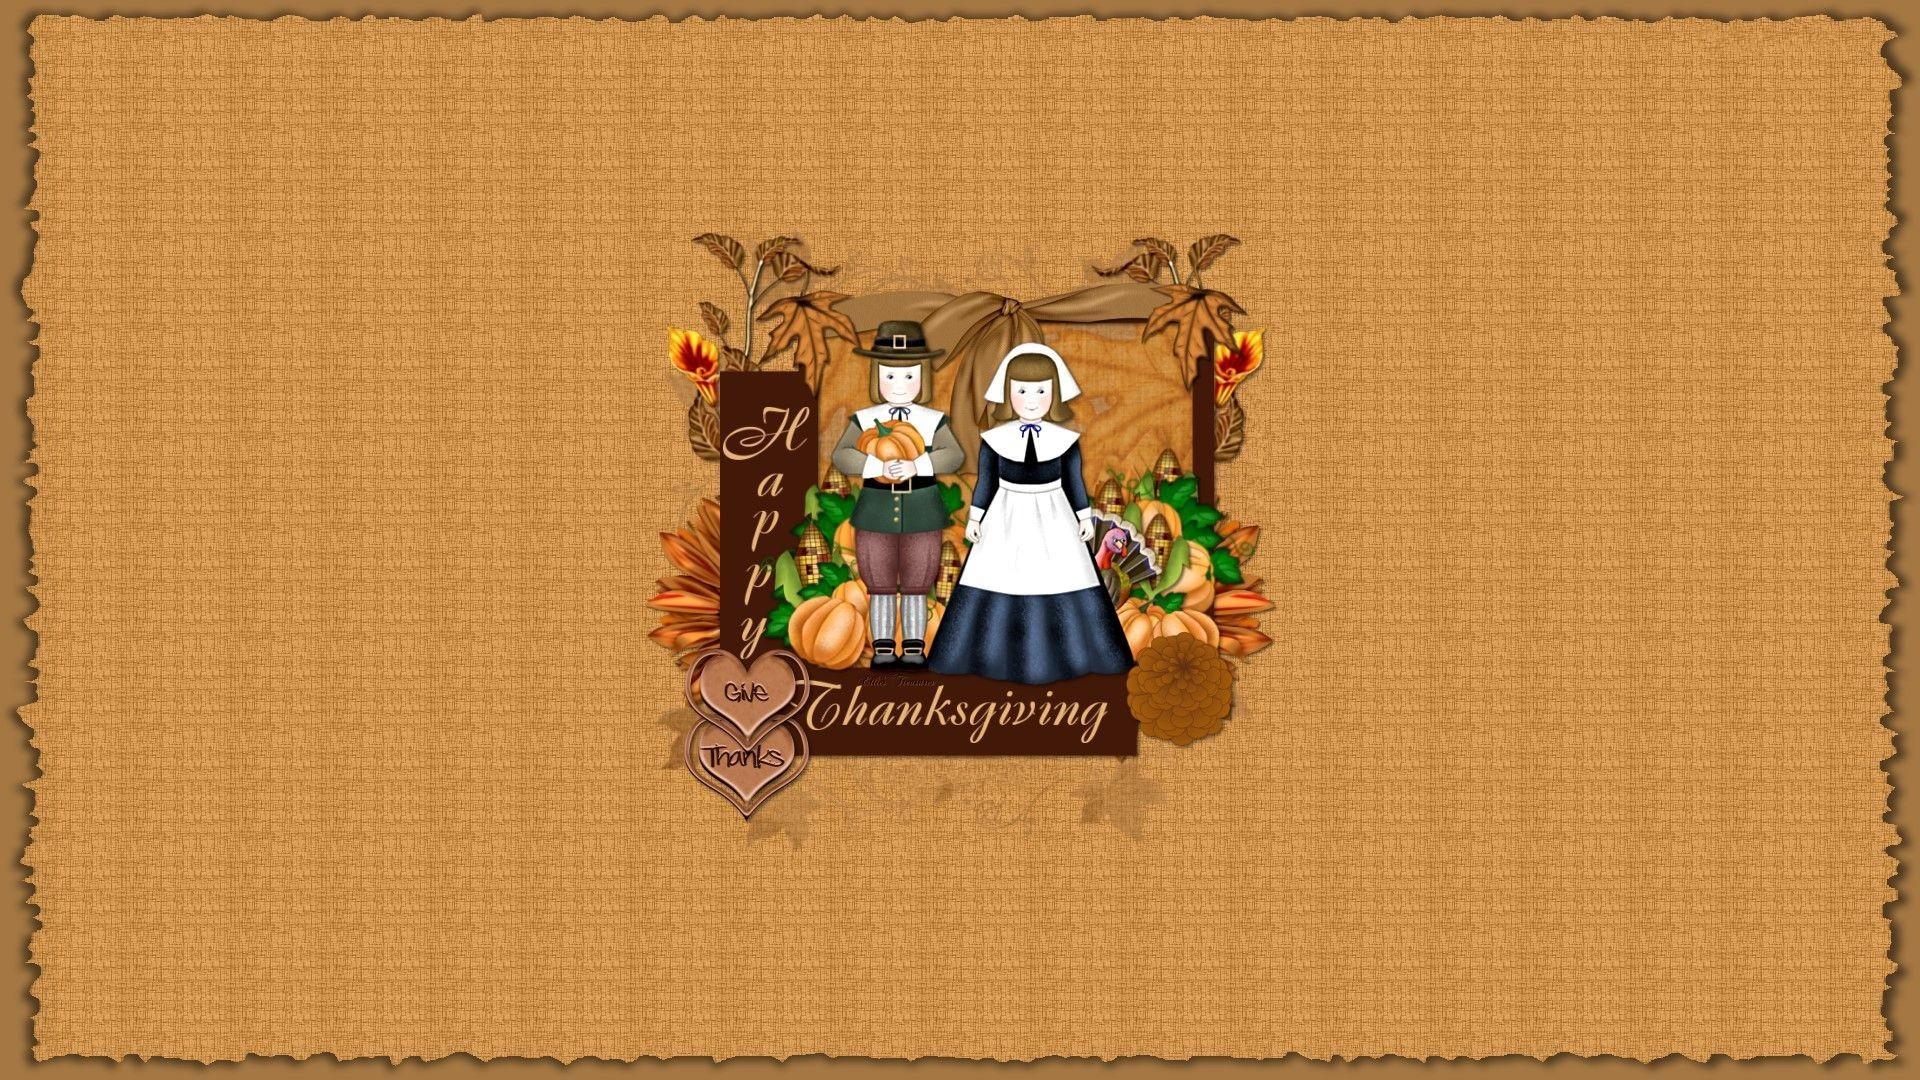 Cute Thanksgiving Wallpaper for Desktop.